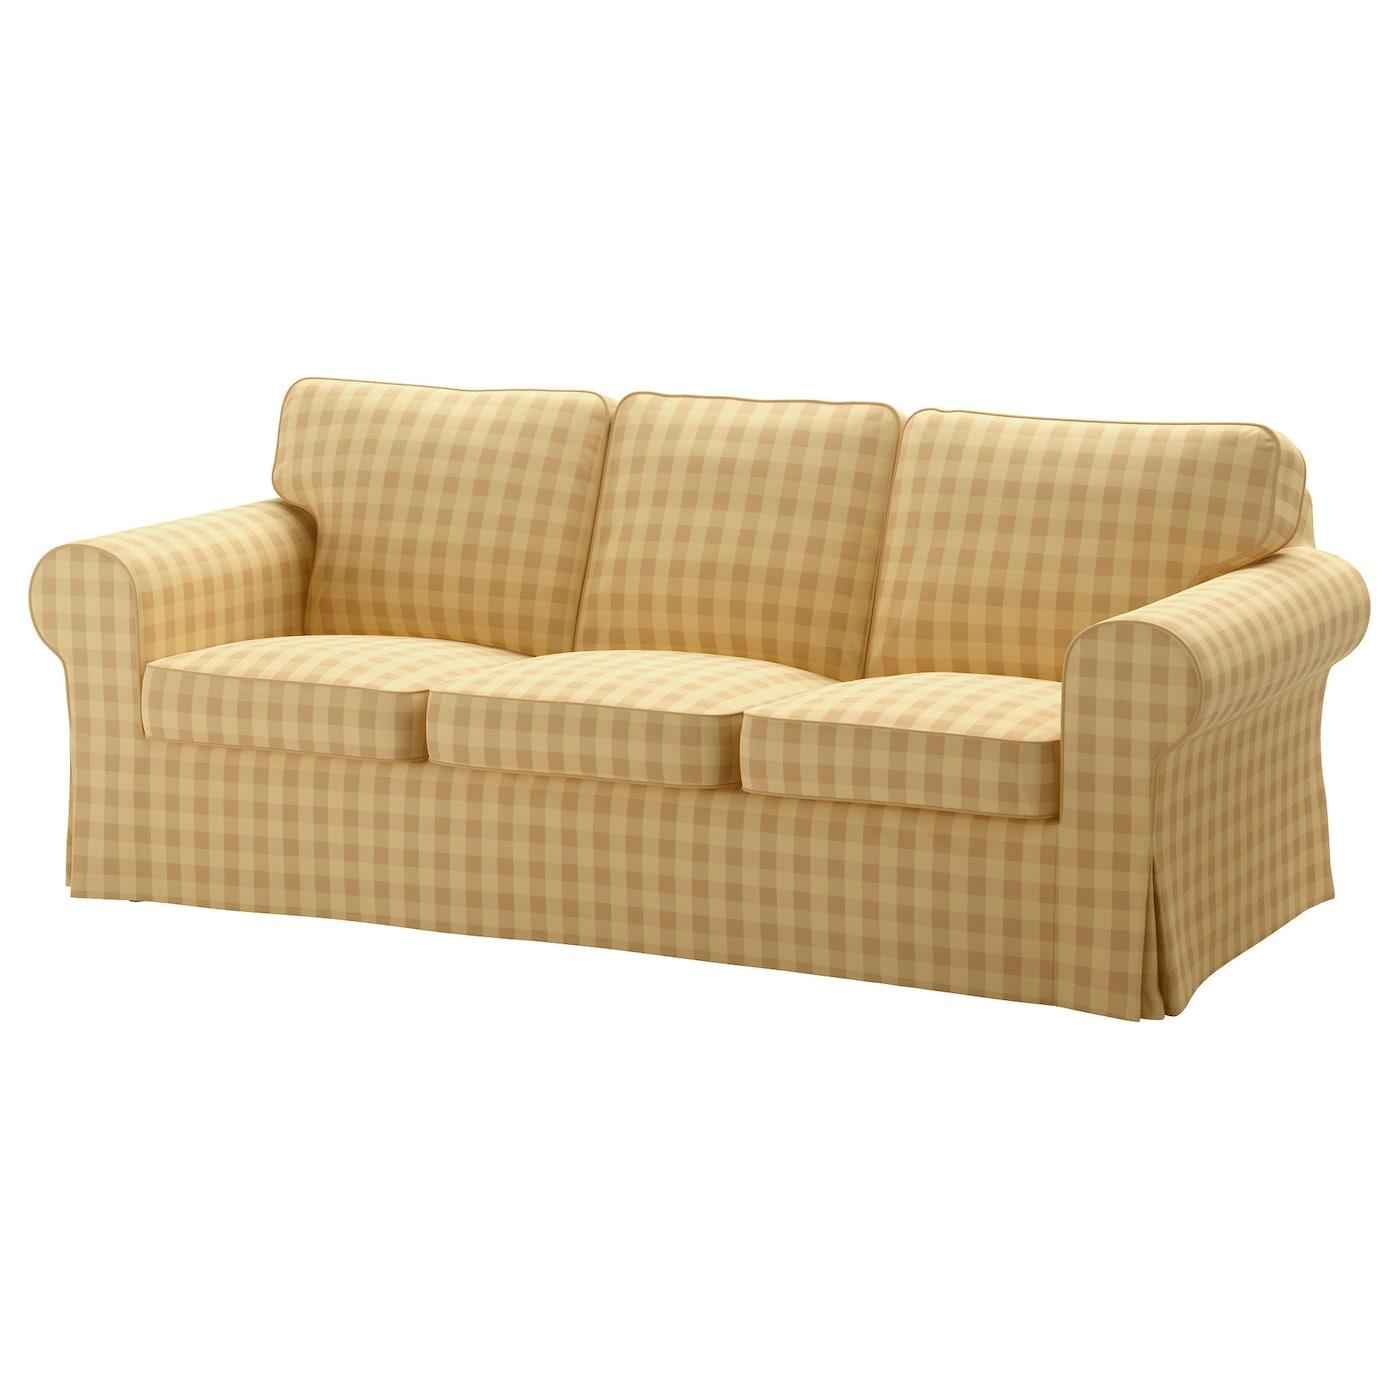 EKTORP IKEA